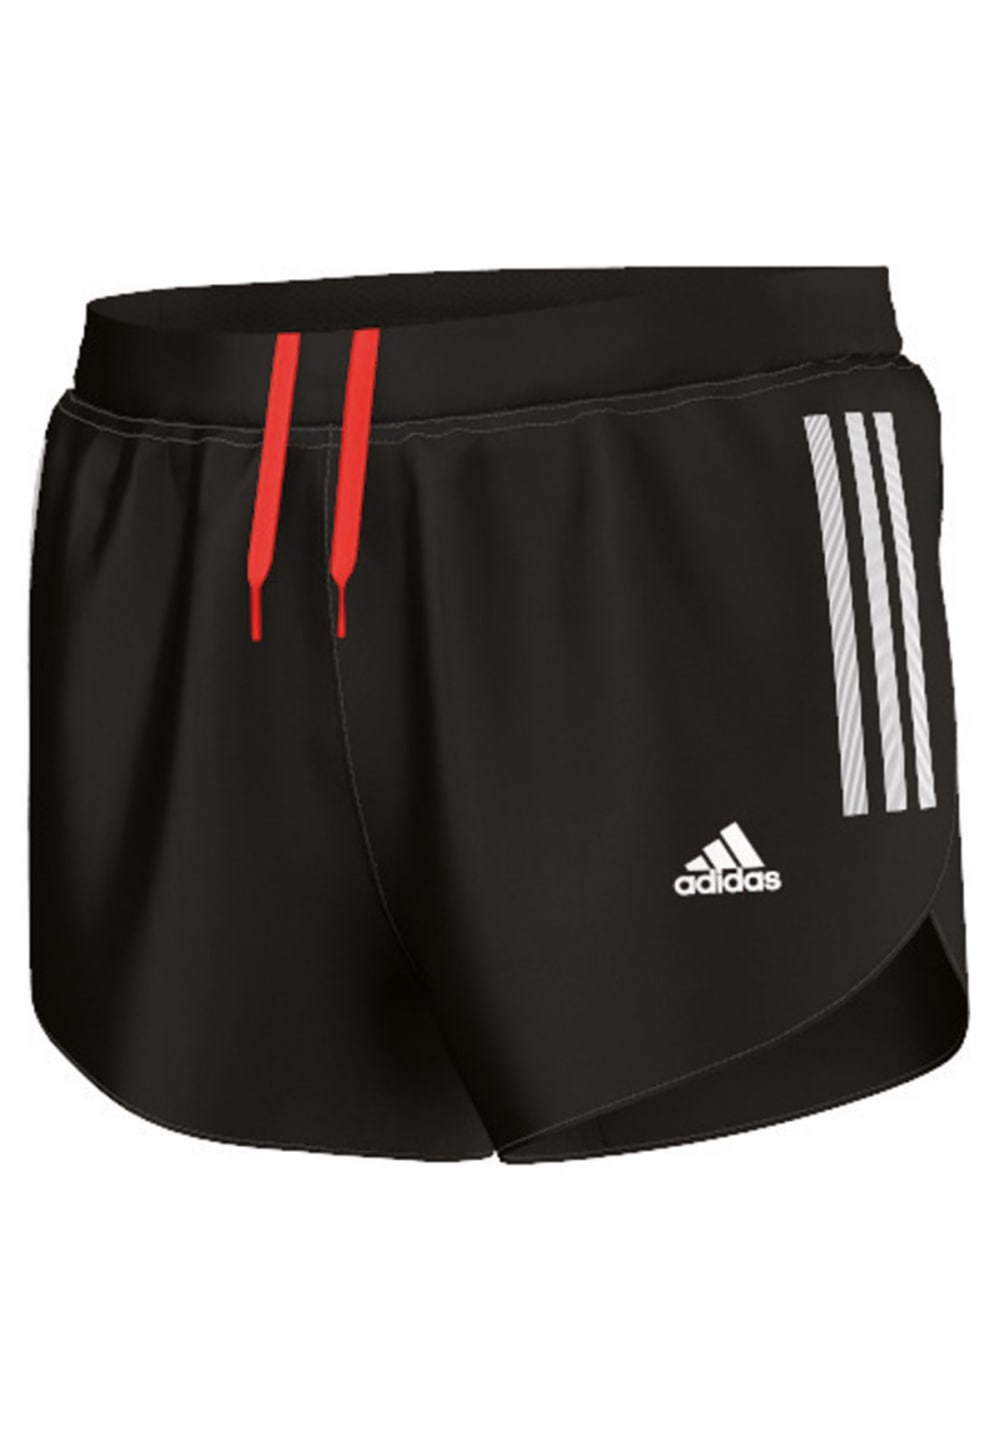 Adidas adiZero Split Short Hommes Pantalons course